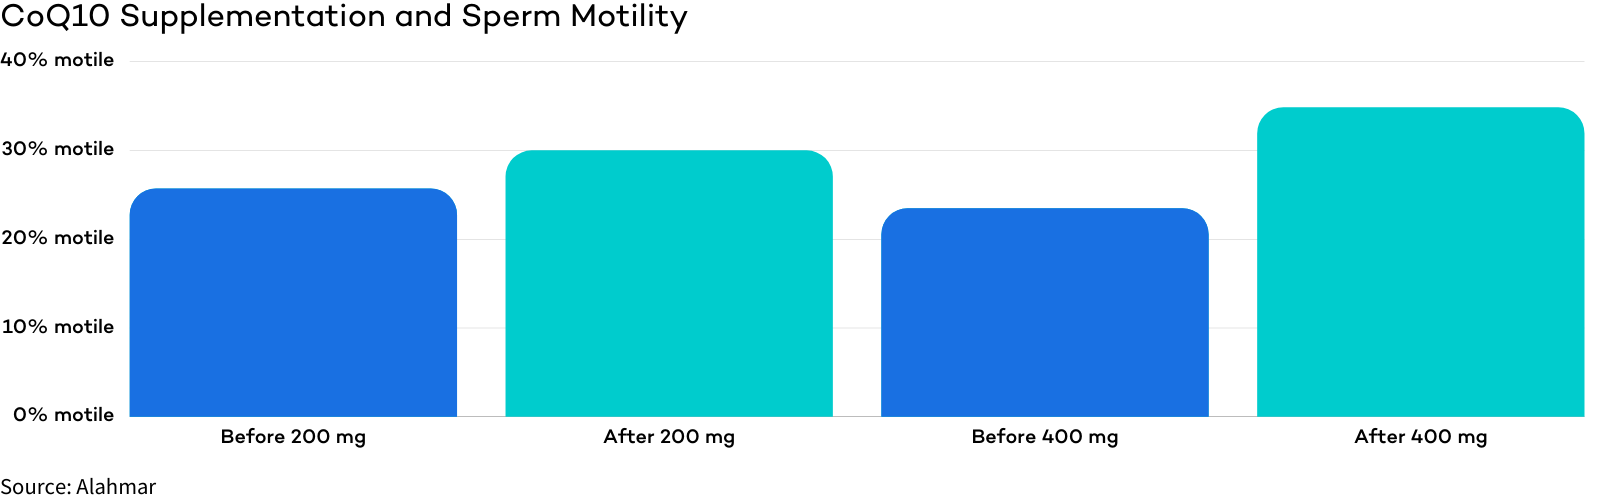 CoQ10 - A Top Male Fertility Vitamin for Sperm Motility